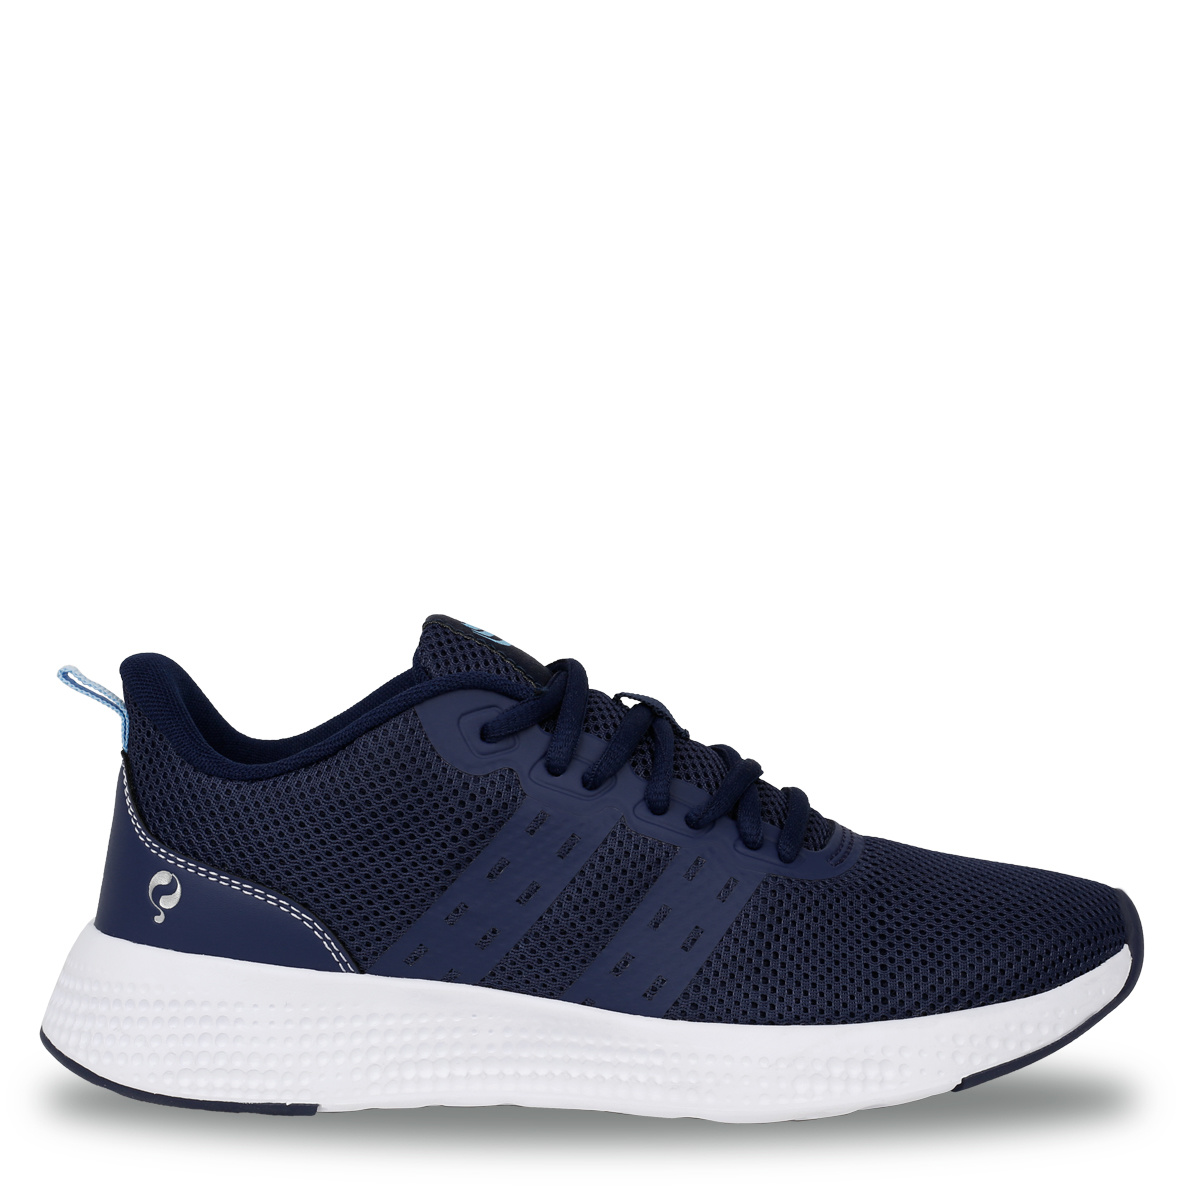 Dames Sneaker Oostduin - Donkerblauw/Lichtblauw